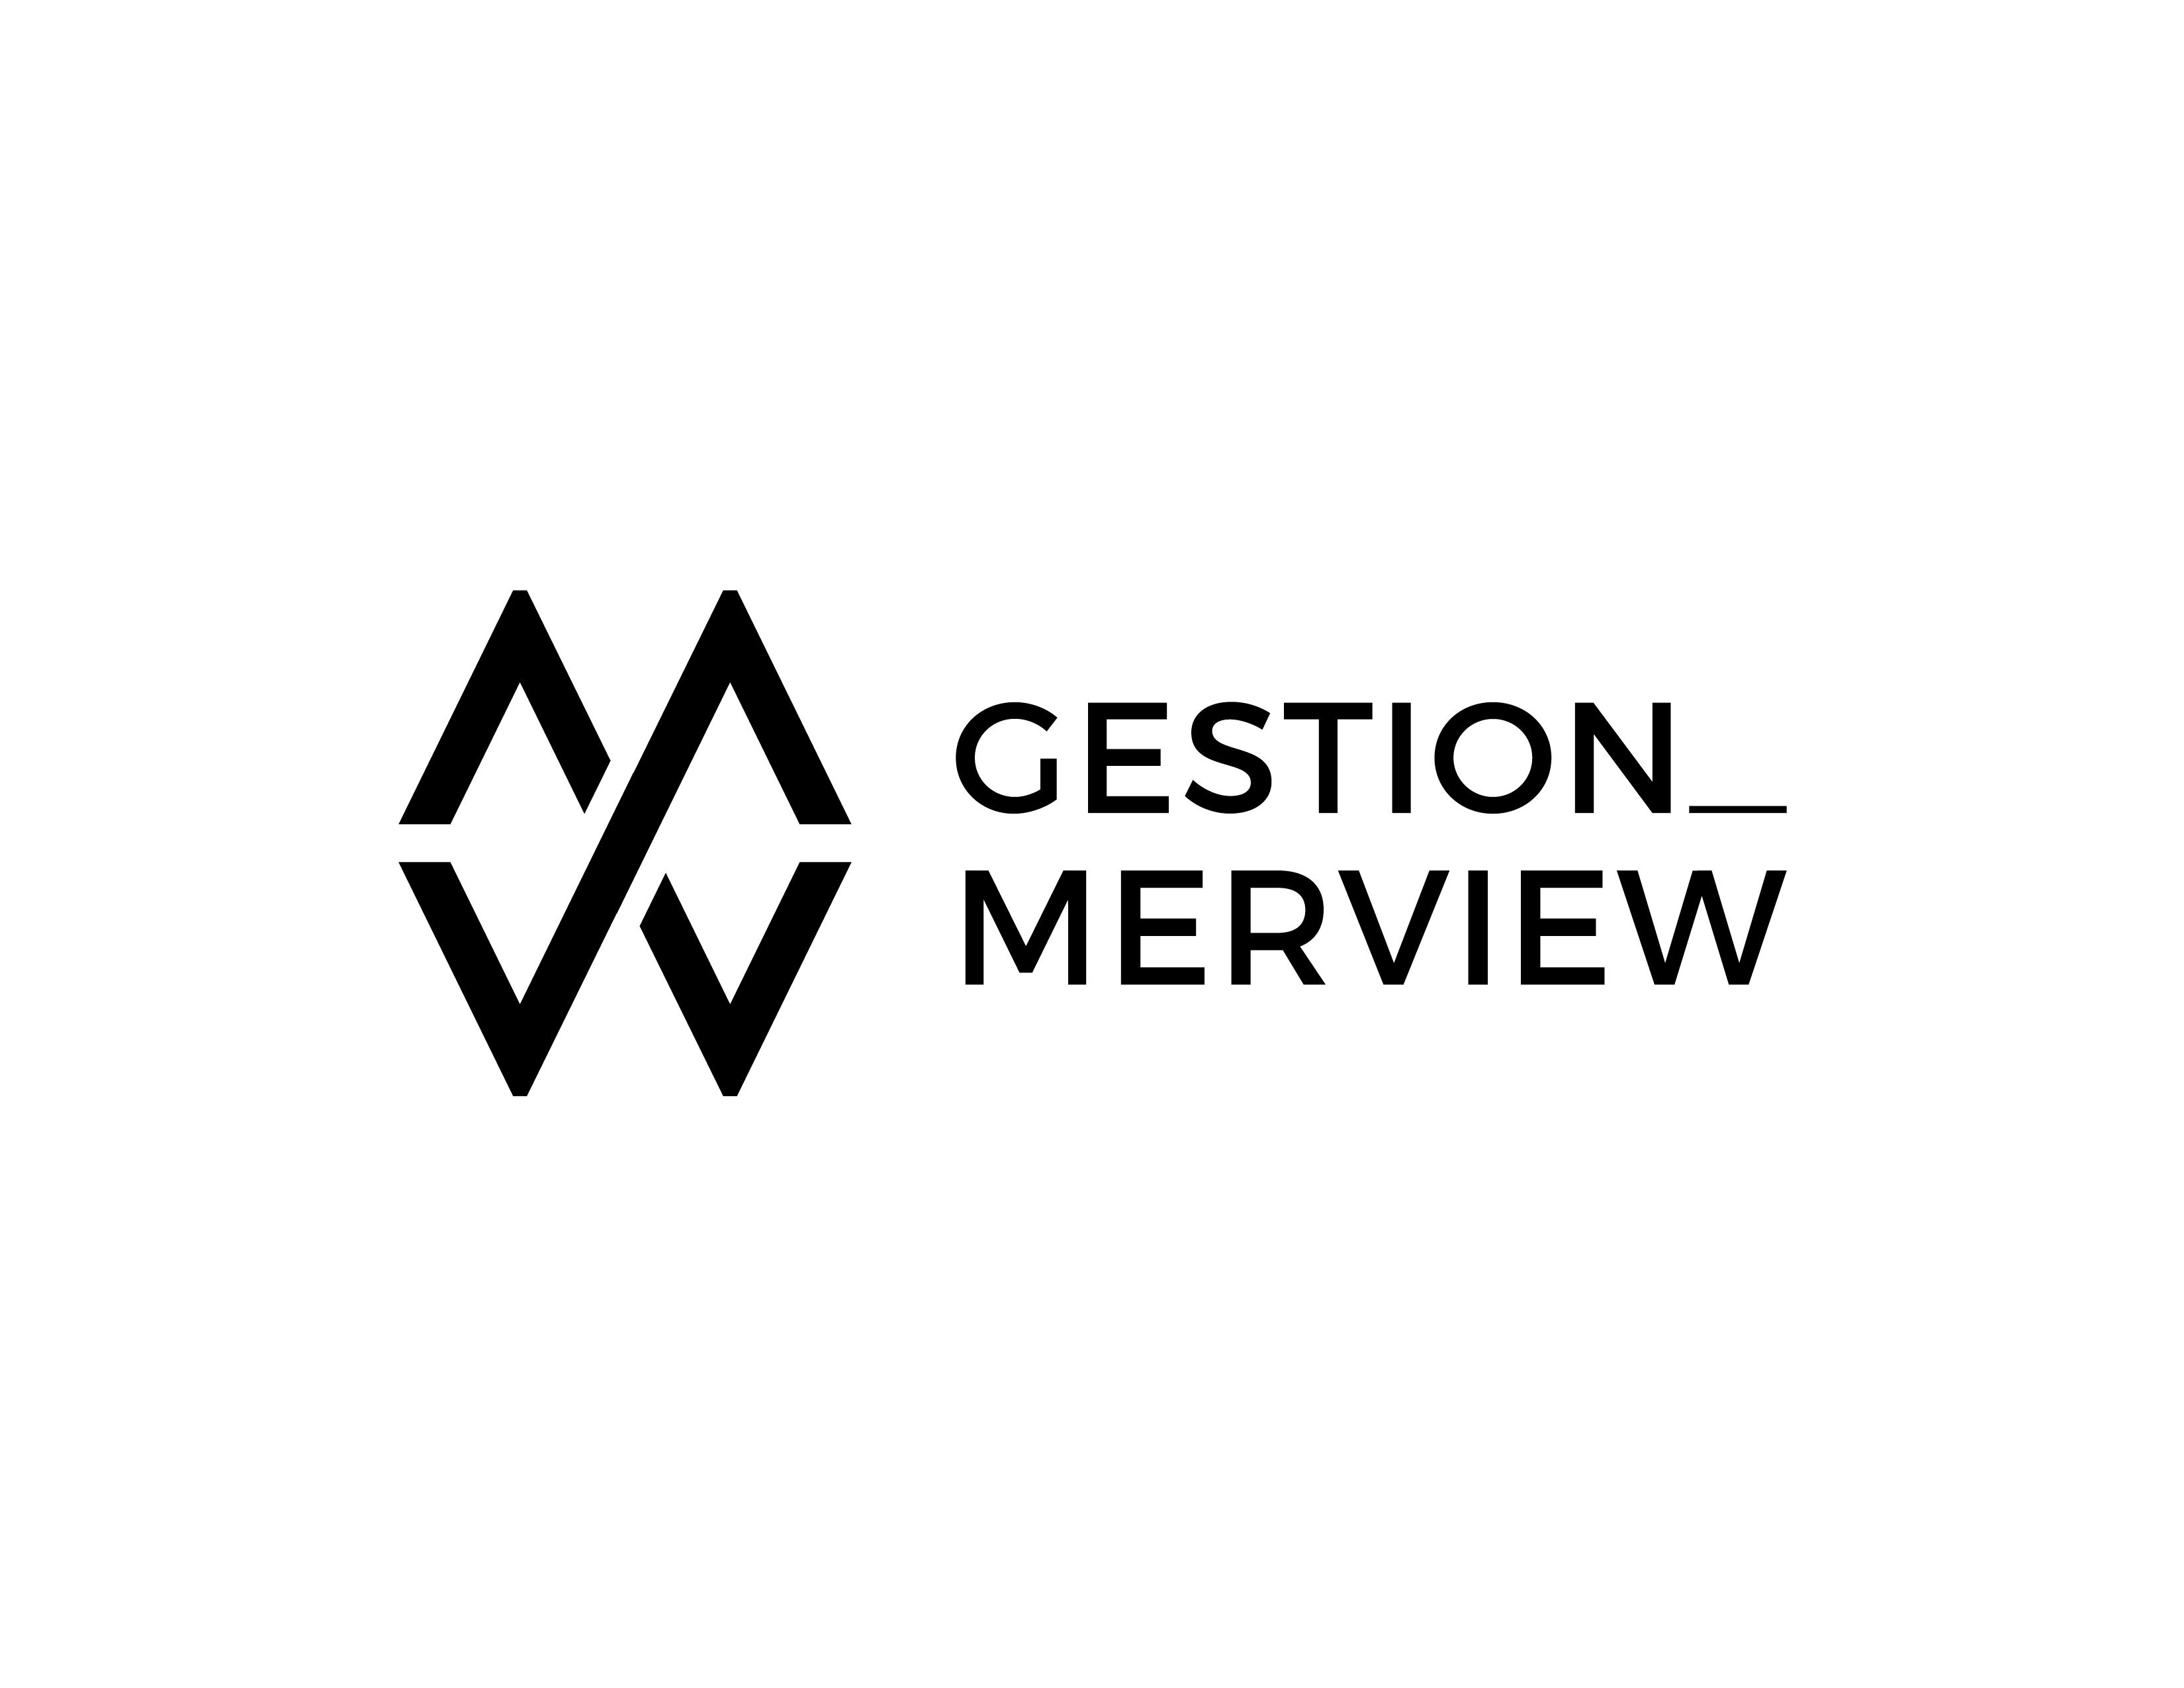 Logo Gestion Merview